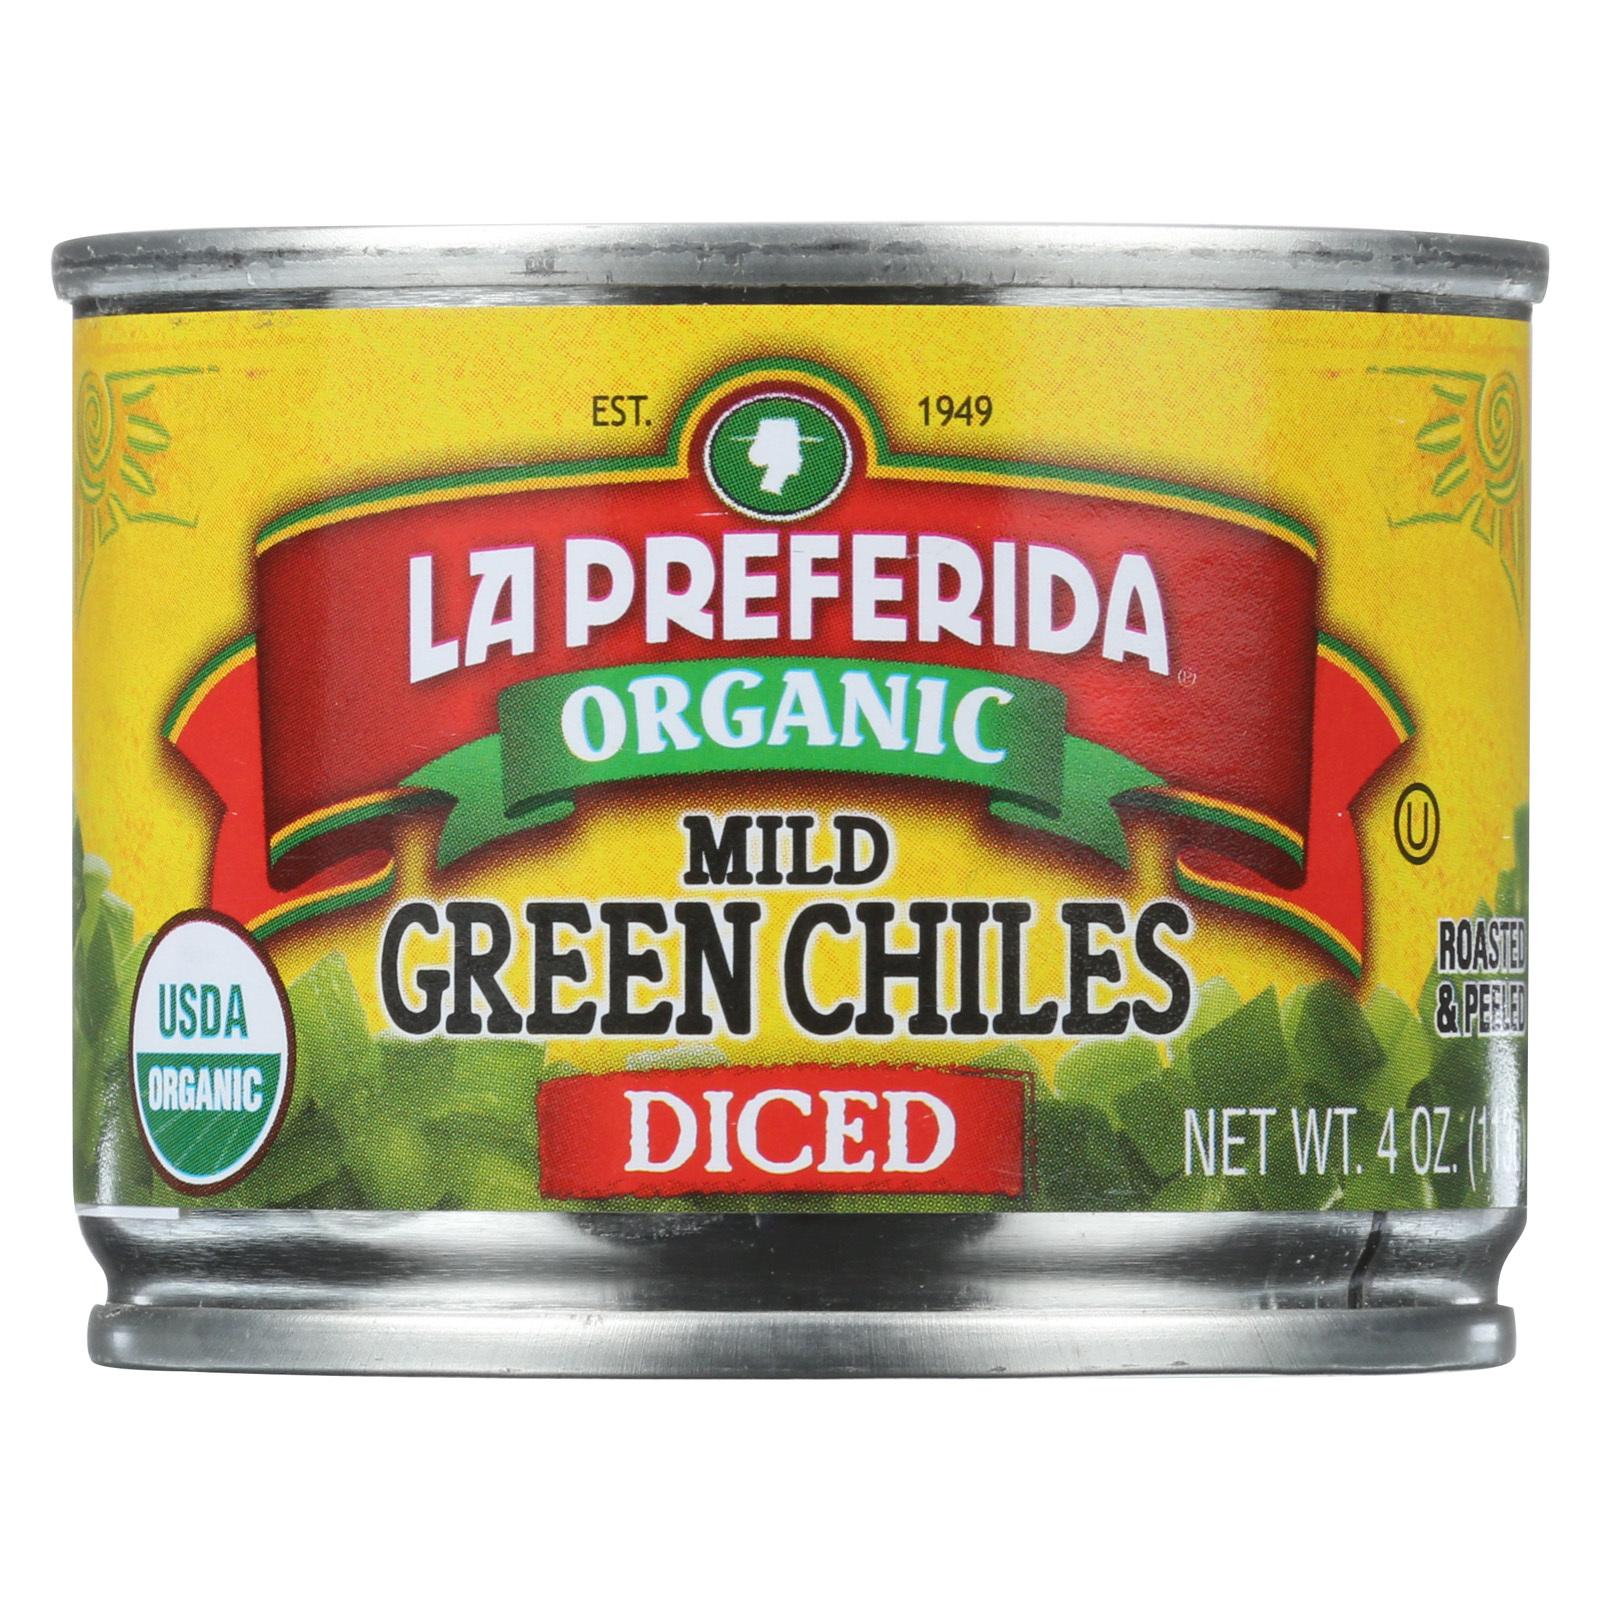 La Preferida Diced Tomatoes - Green Chilies - Case of 12 - 4 Fl oz.